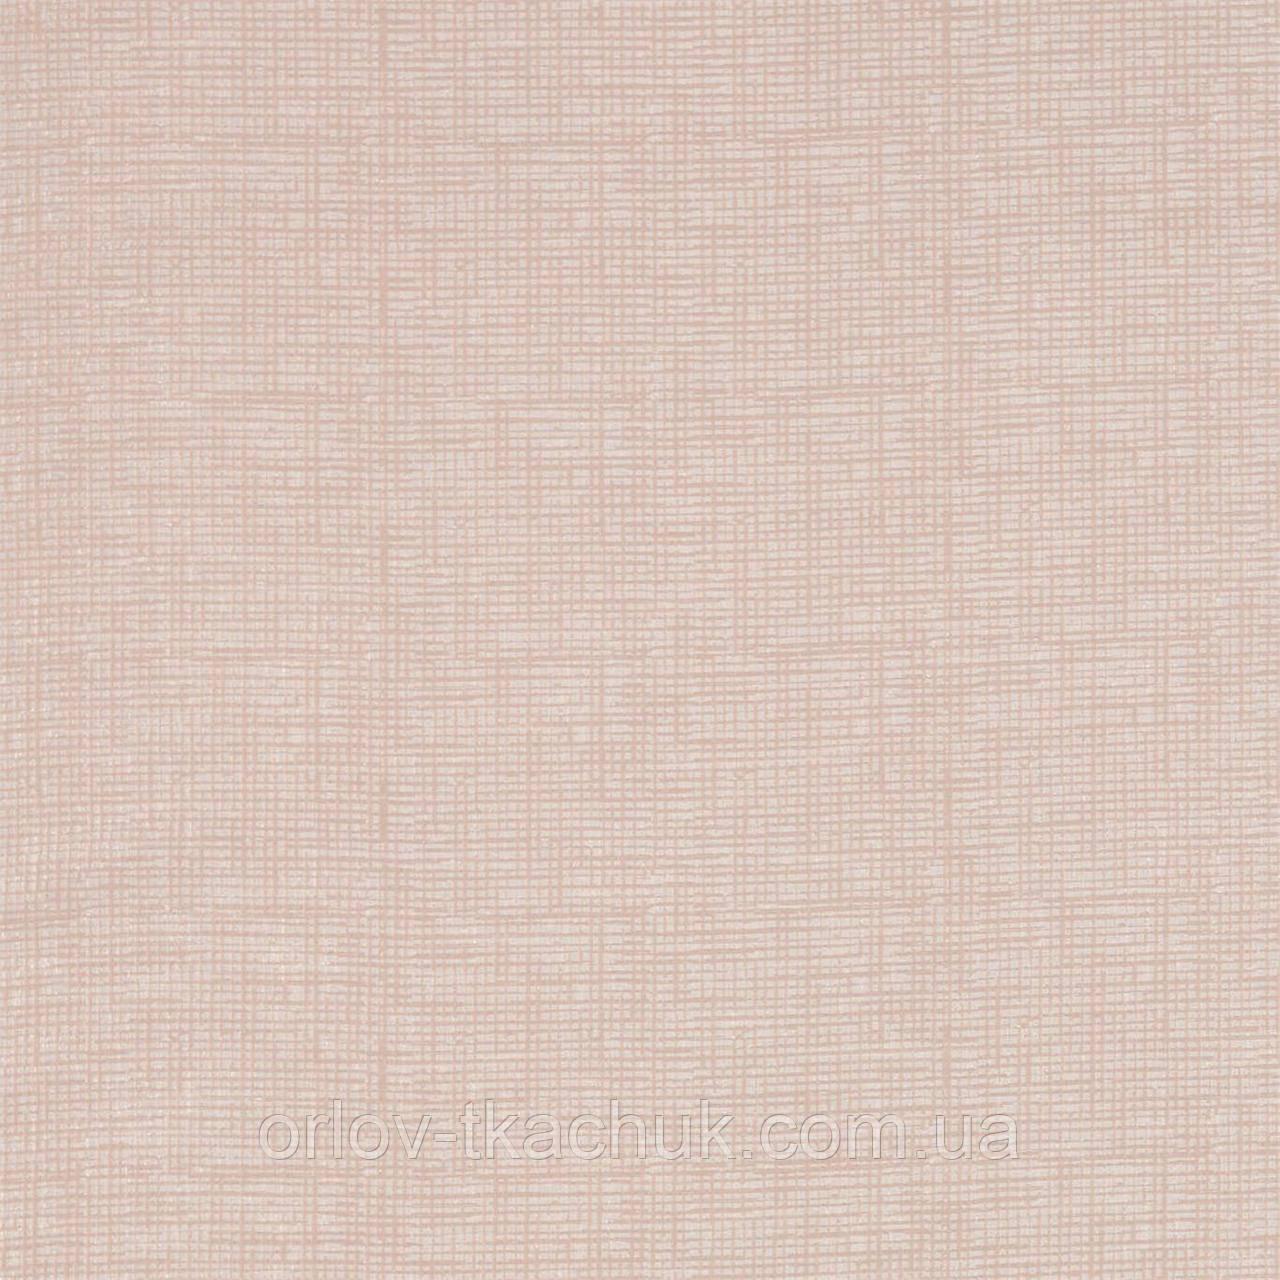 Ткань для штор Leno Harlequin